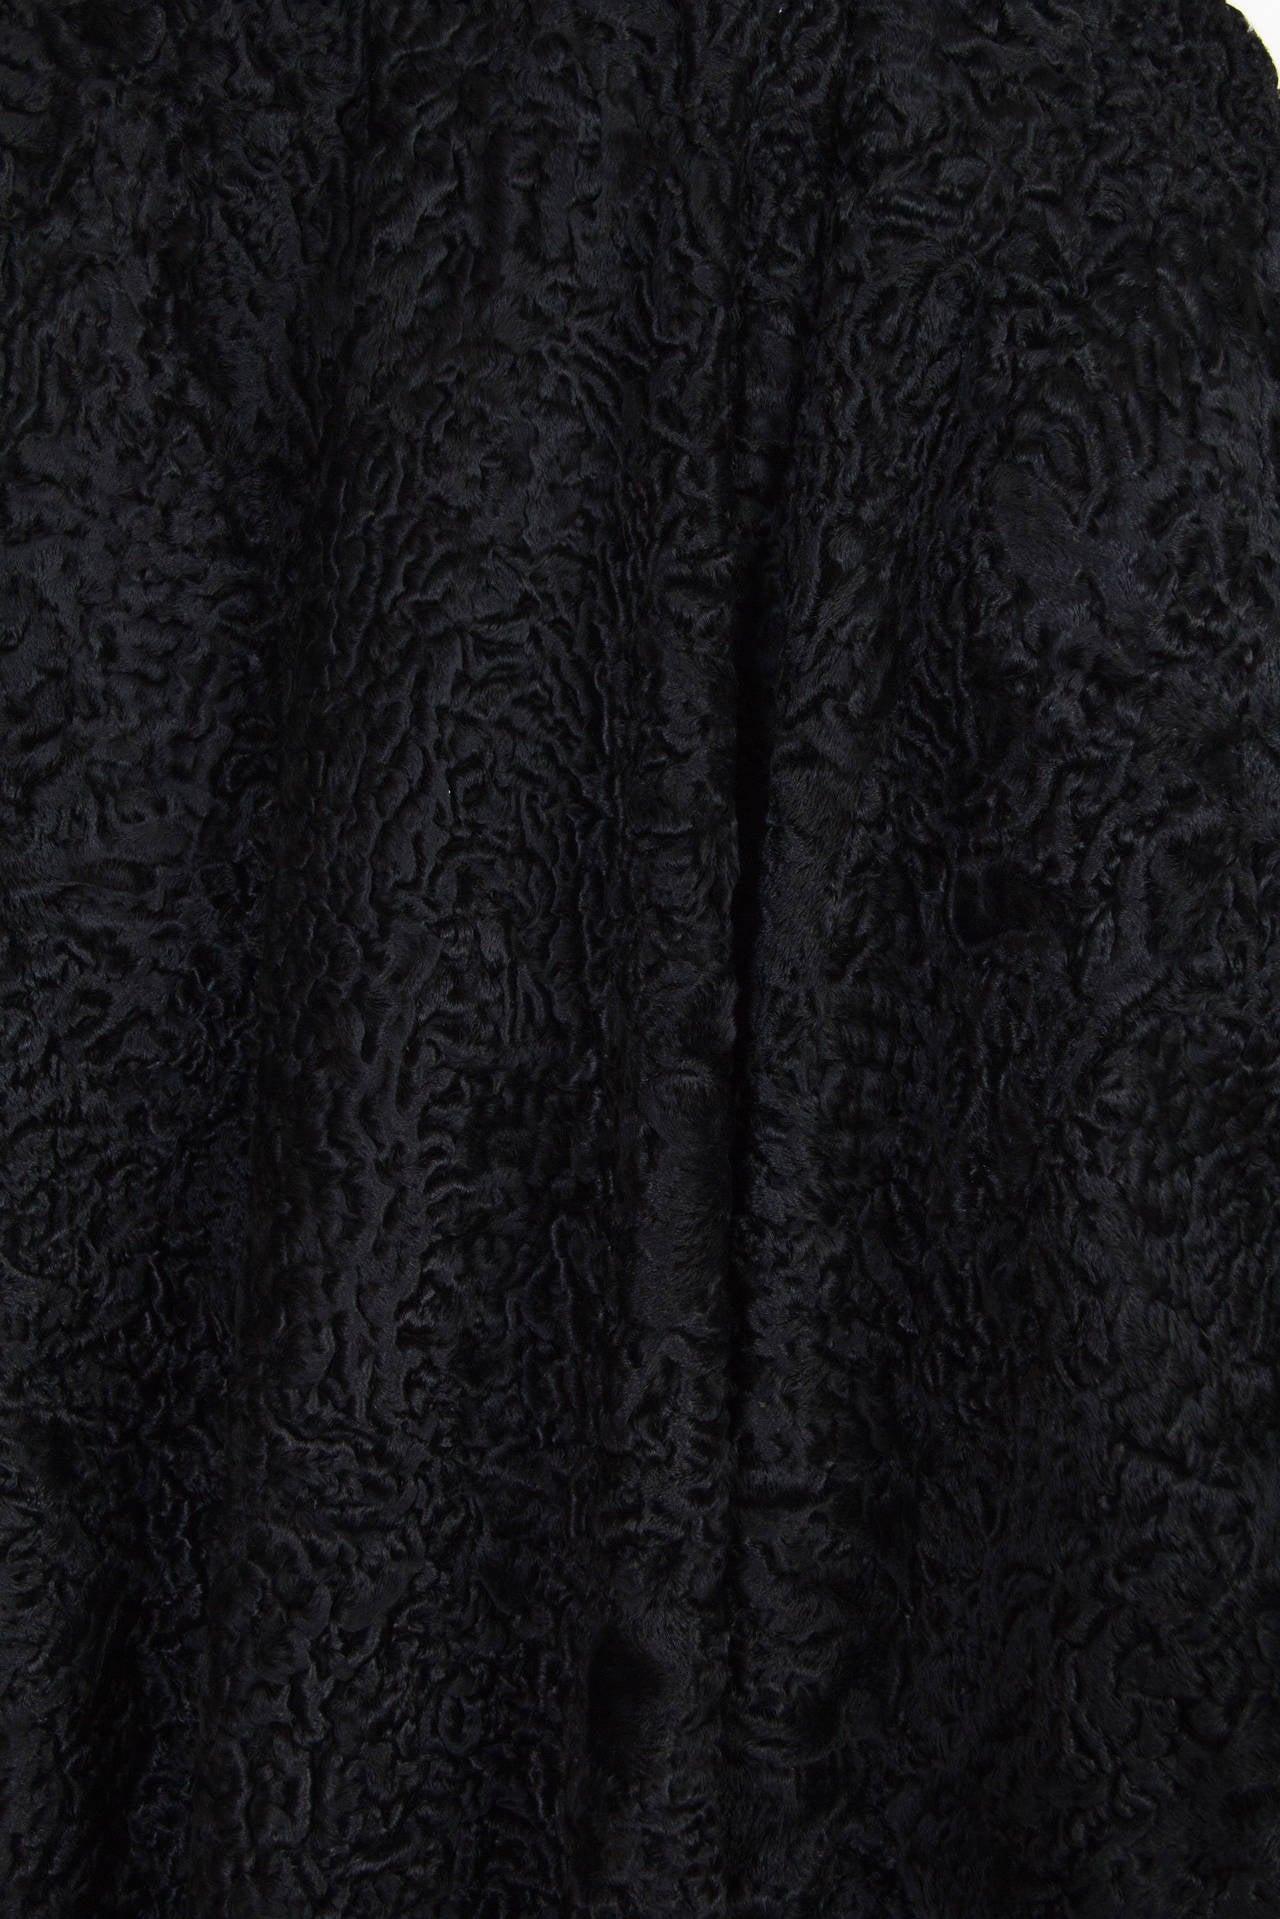 Patrick Kelly Asymetrical Minimalist Black Astrakhan Fur Coat 9